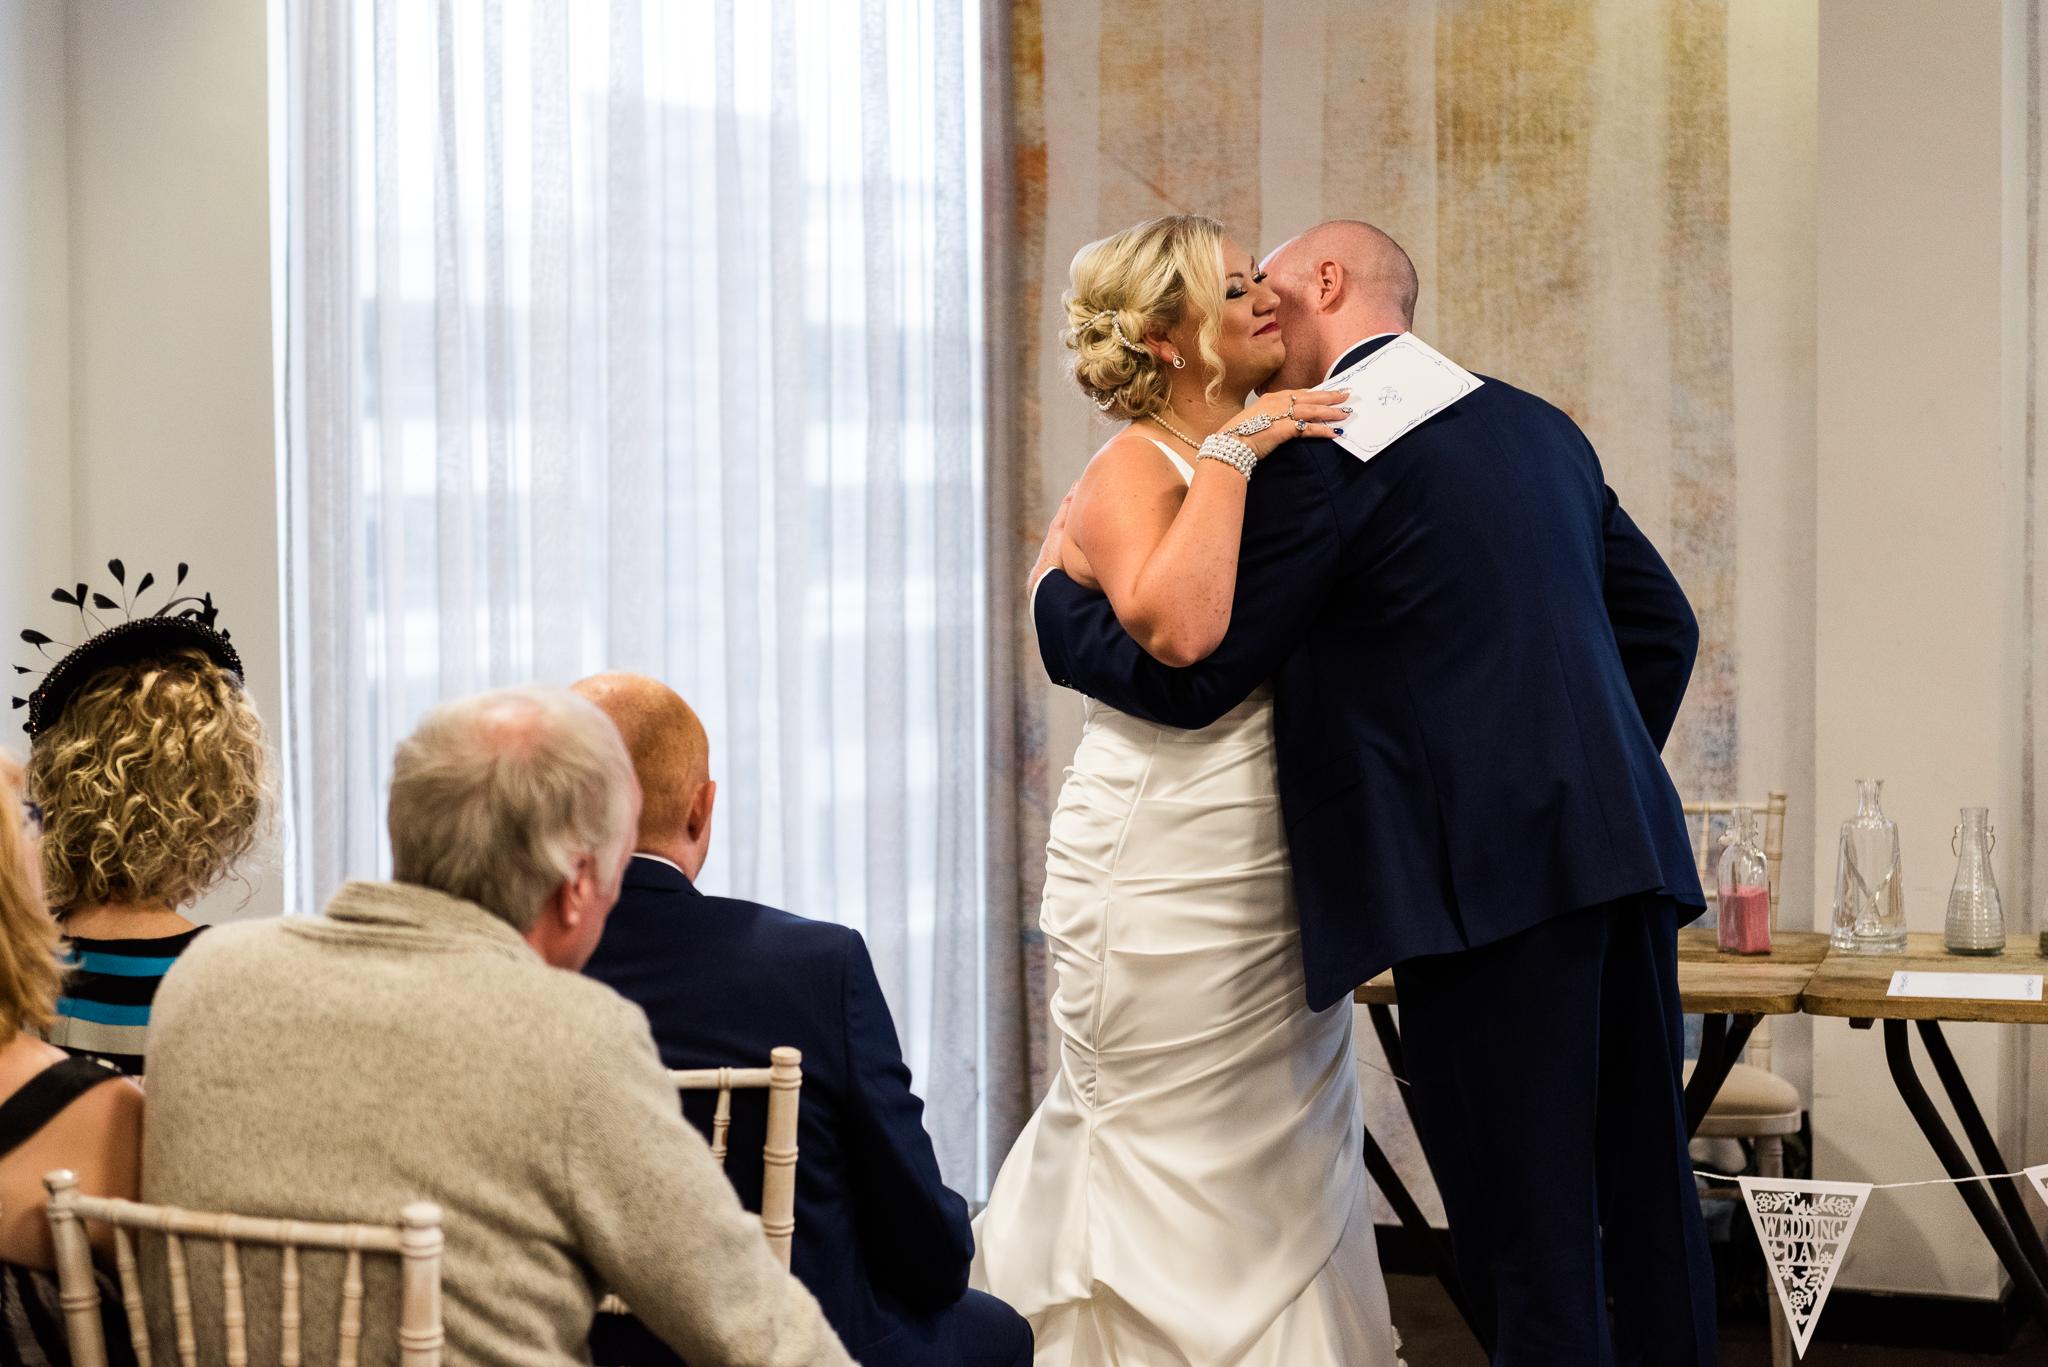 Manchester Wedding Photography On the 7th Media City UK, Salford 20s Art Deco Feathers Urban - Jenny Harper-21.jpg